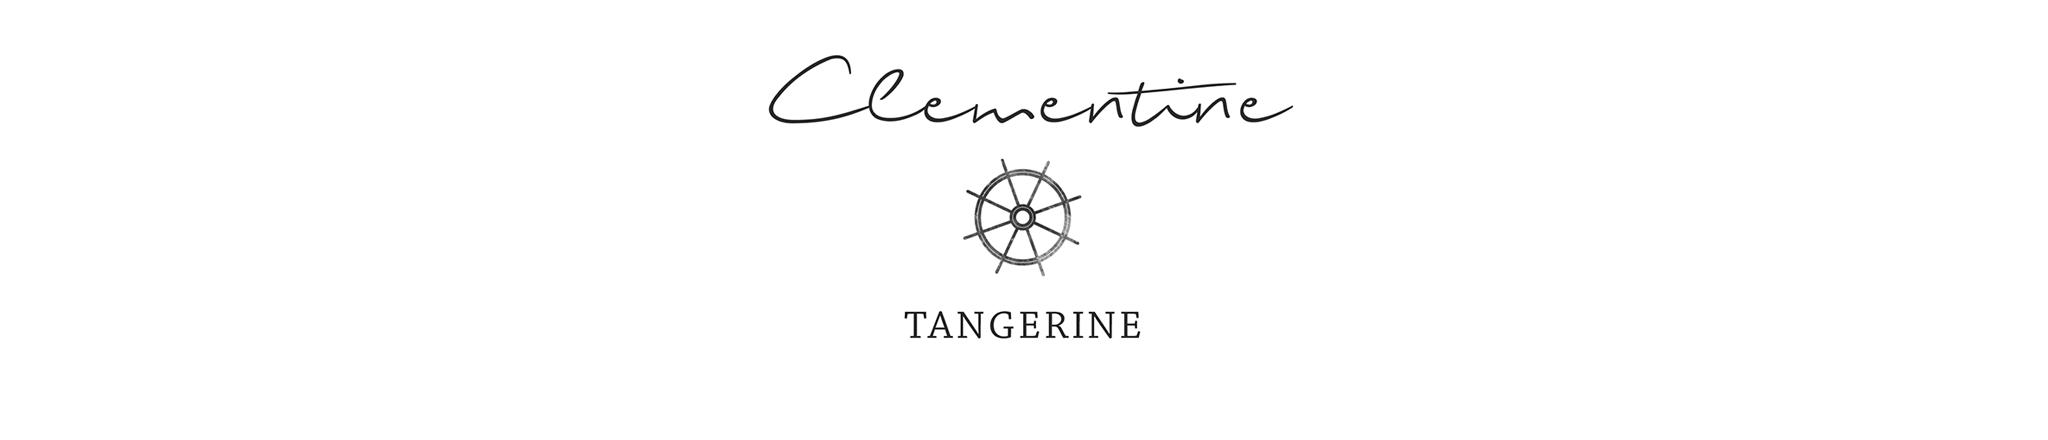 Travelling Tangerine